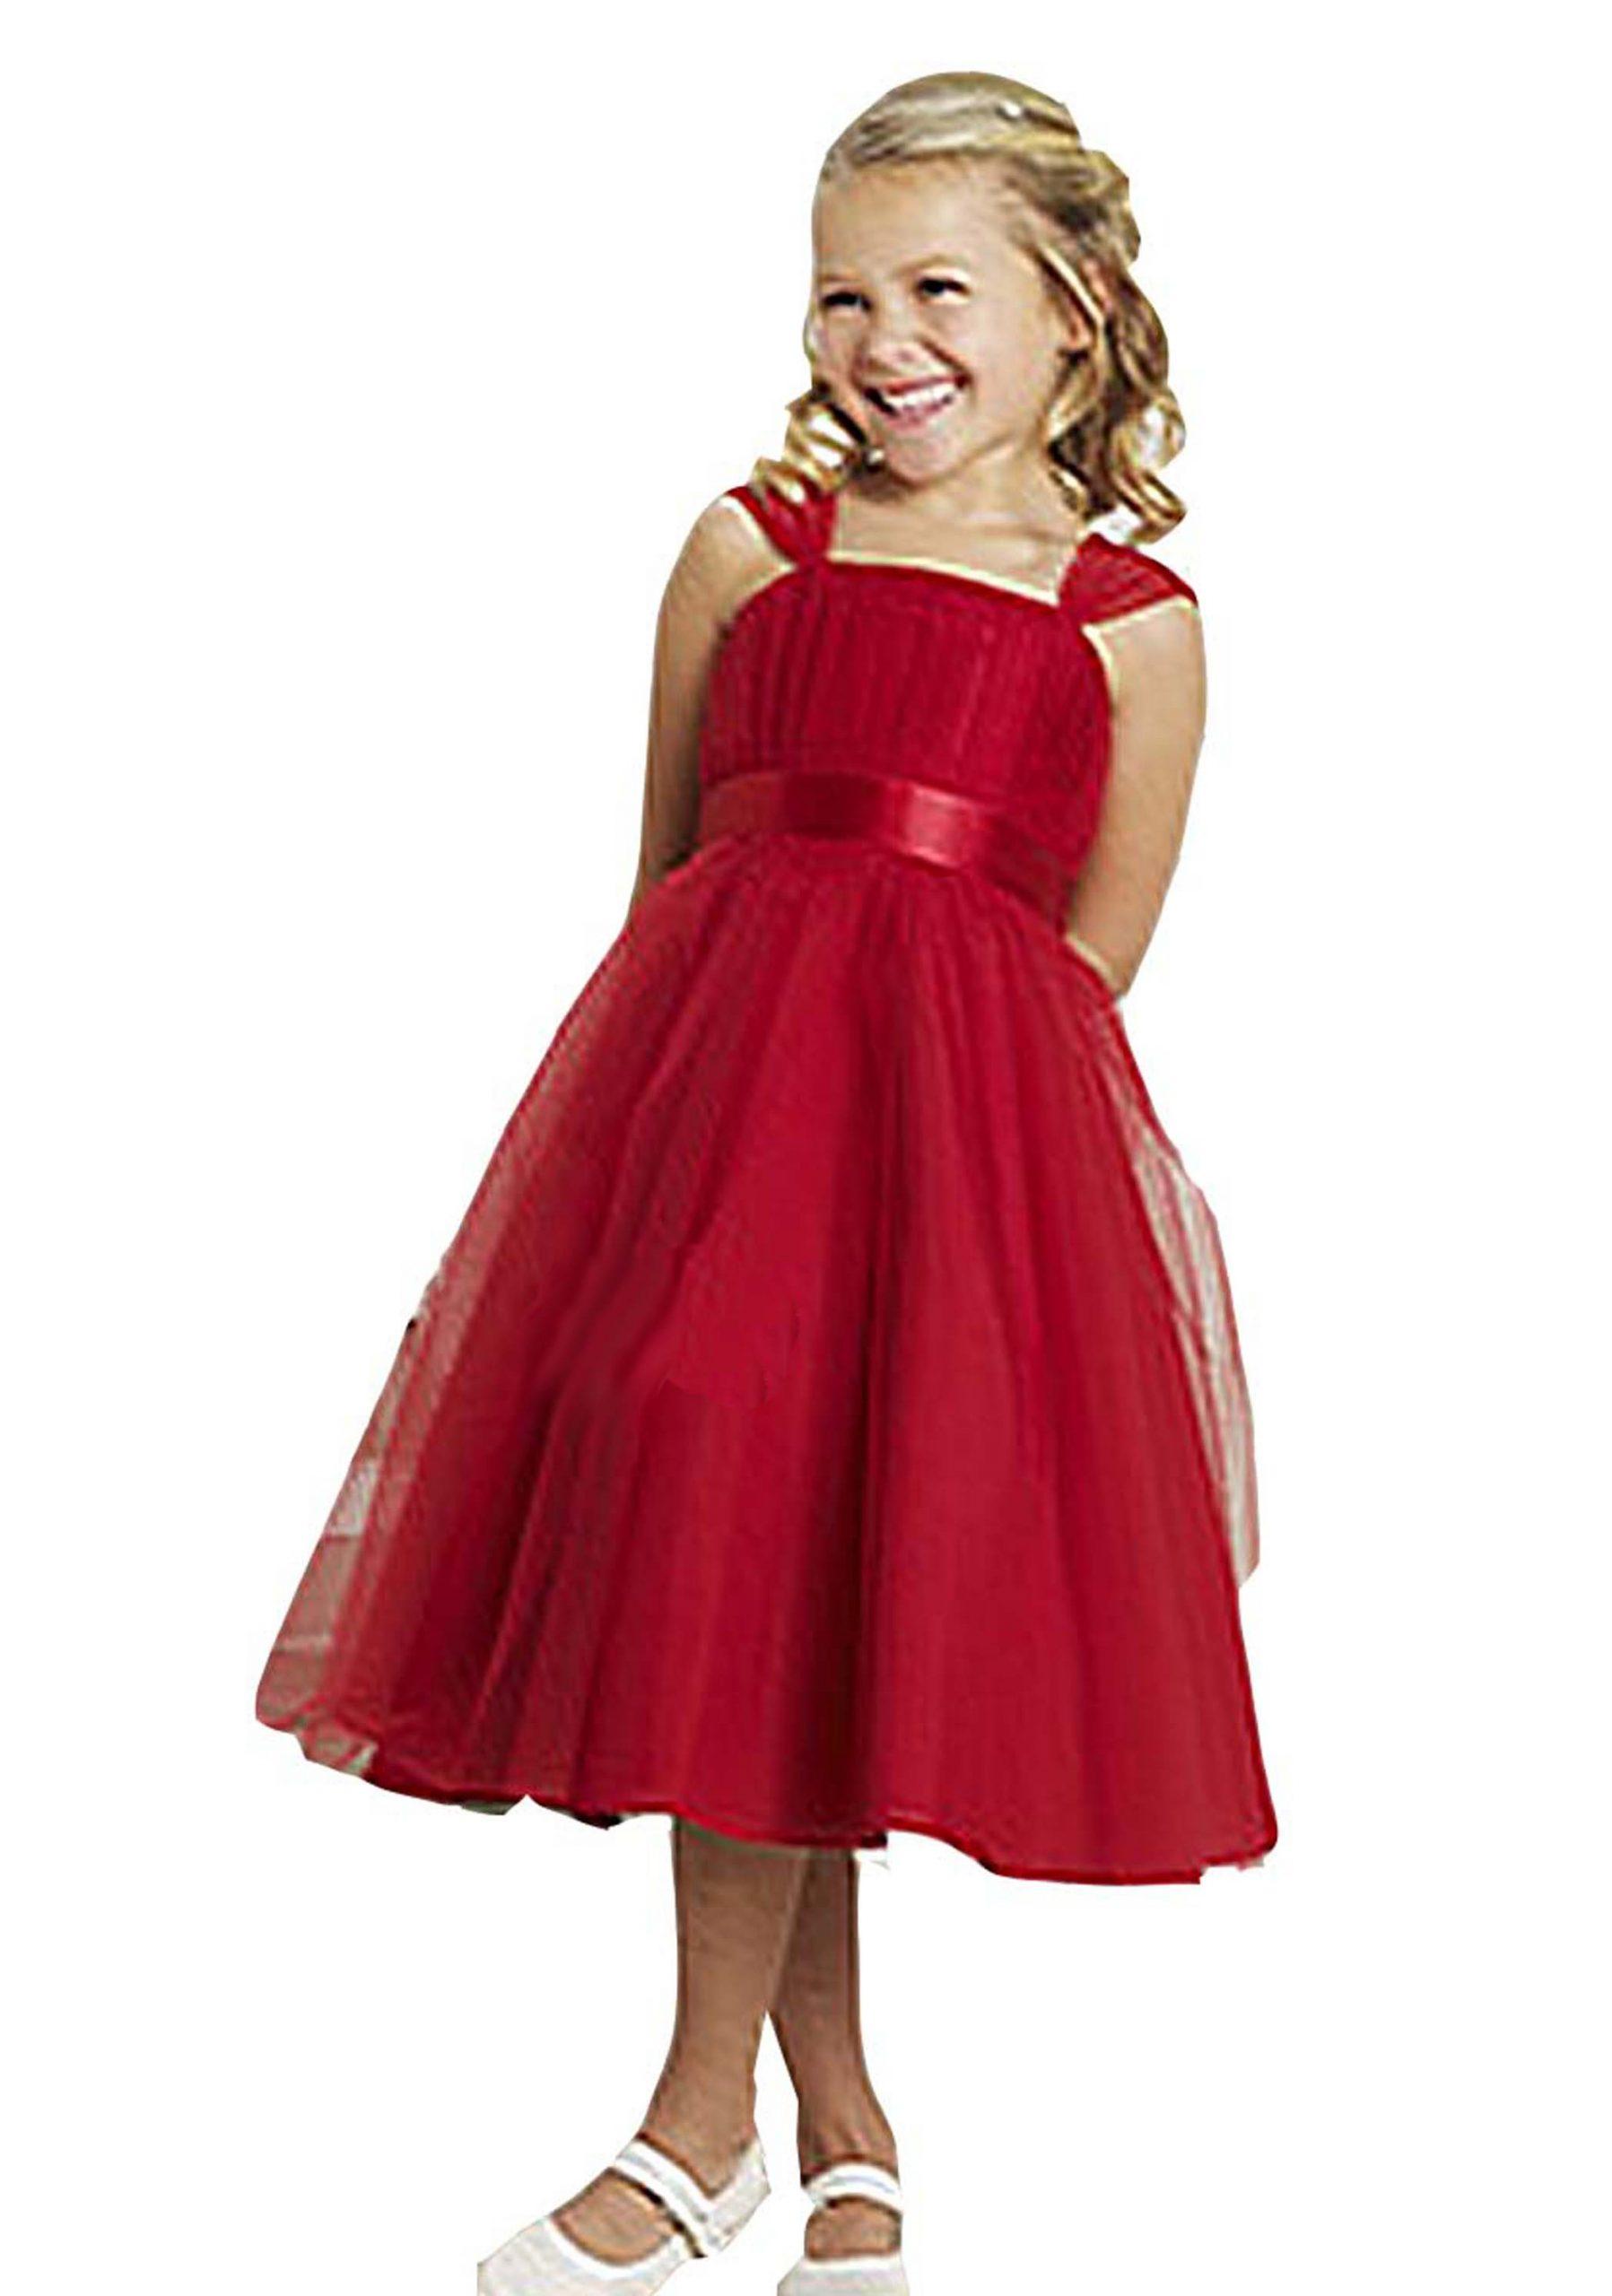 Helgasmodewelt  Blumenmädchen Kleid Festkleid Mit Tüll